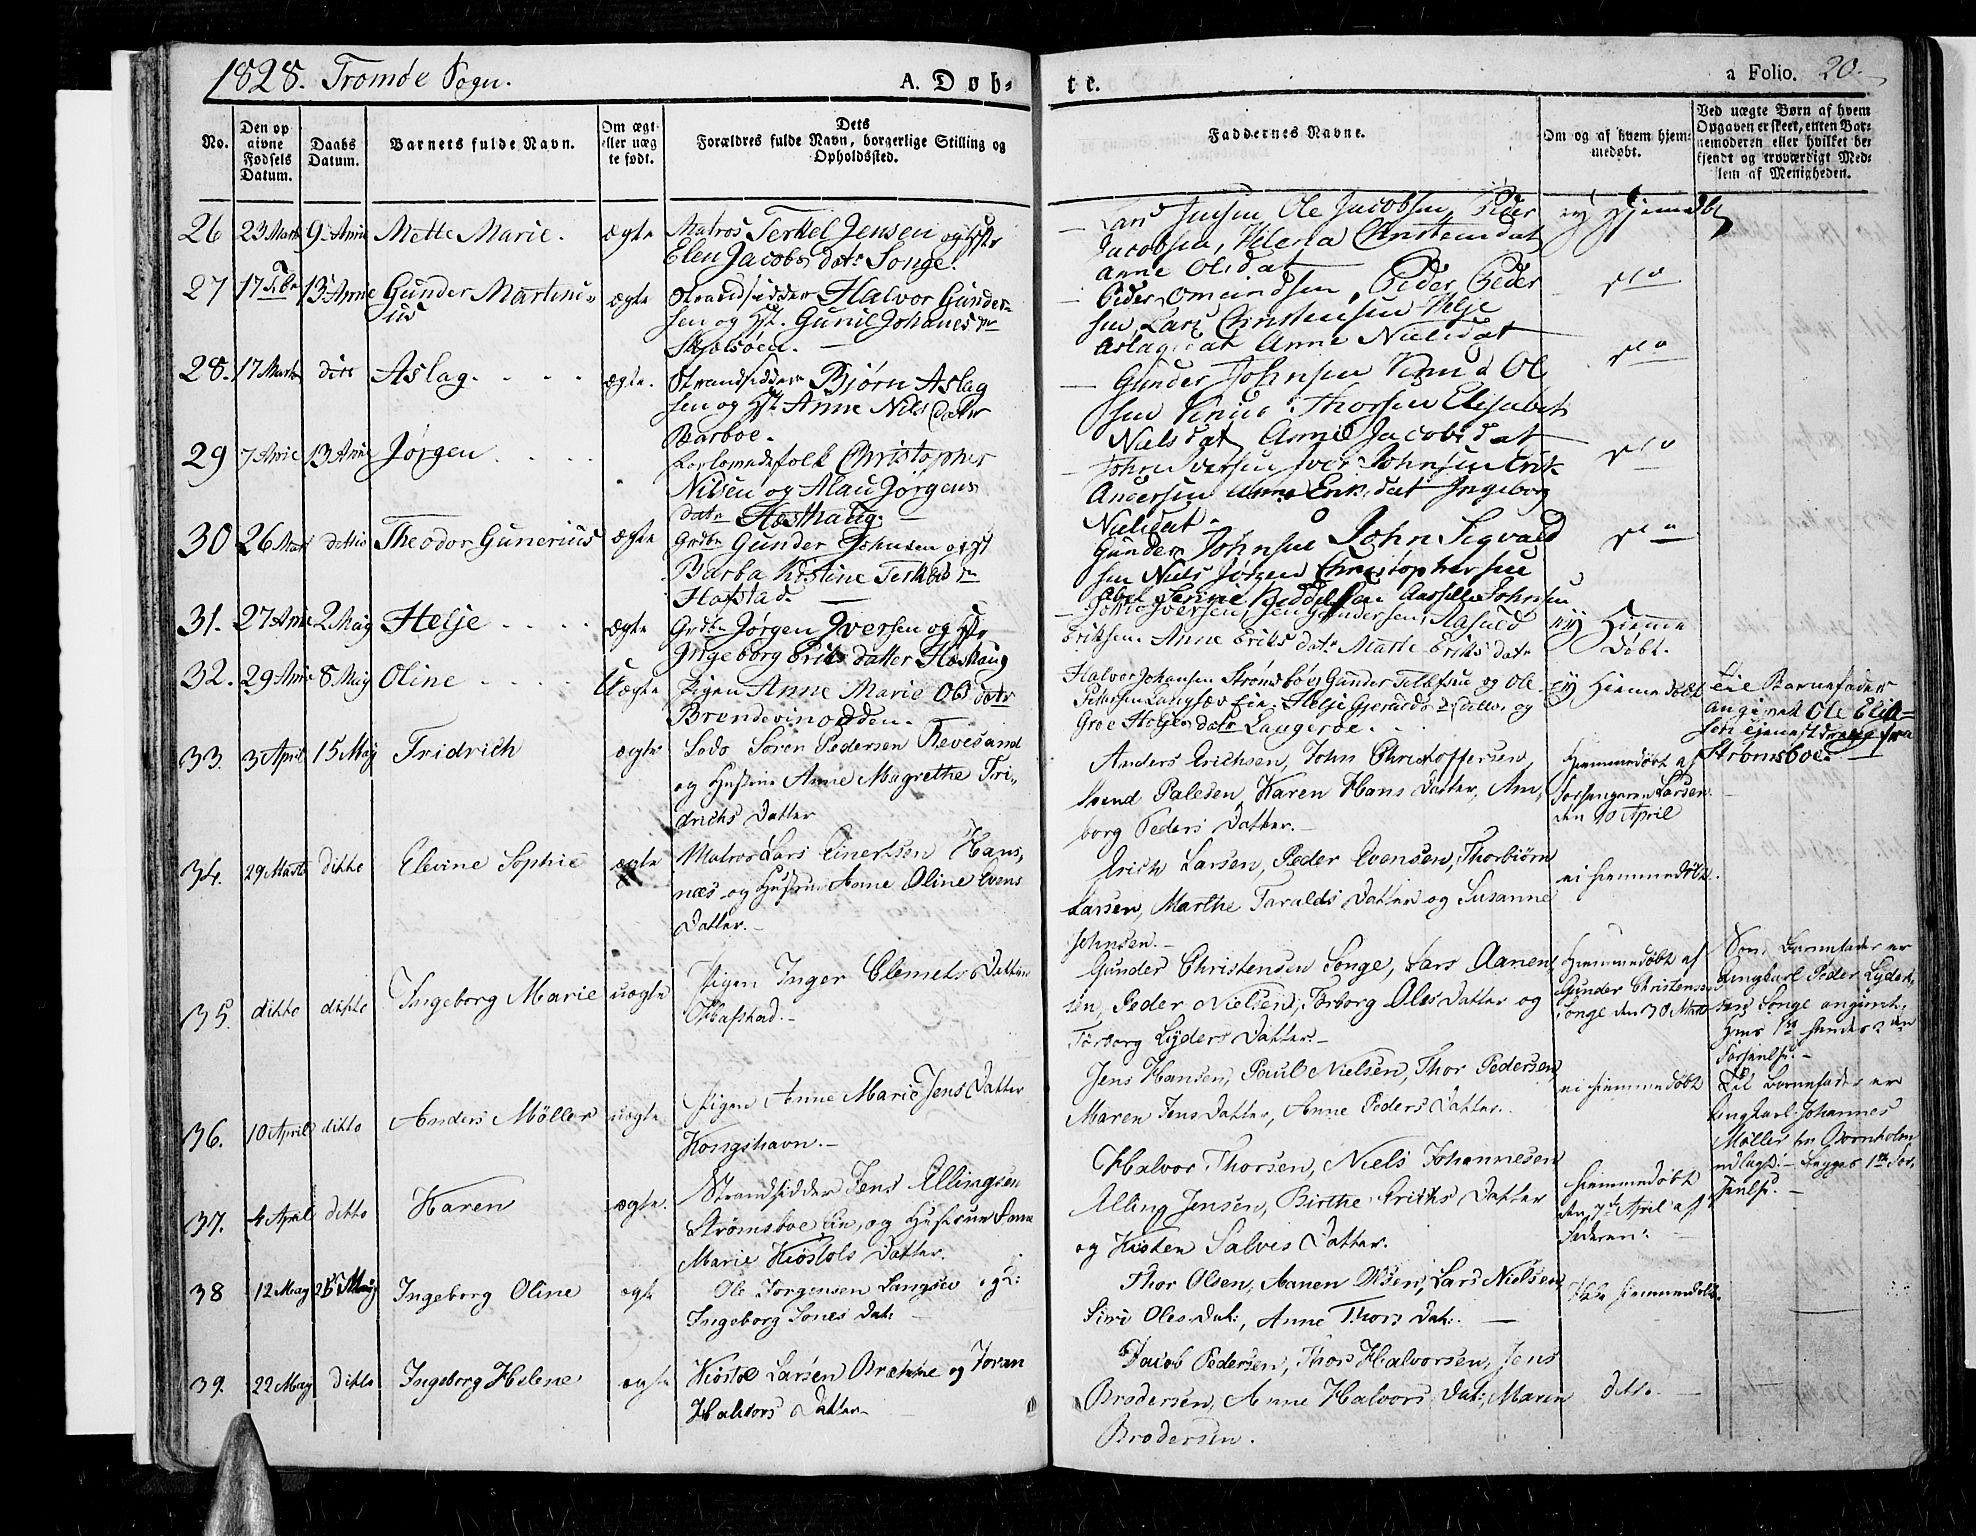 SAK, Tromøy sokneprestkontor, F/Fa/L0003: Ministerialbok nr. A 3, 1825-1837, s. 20